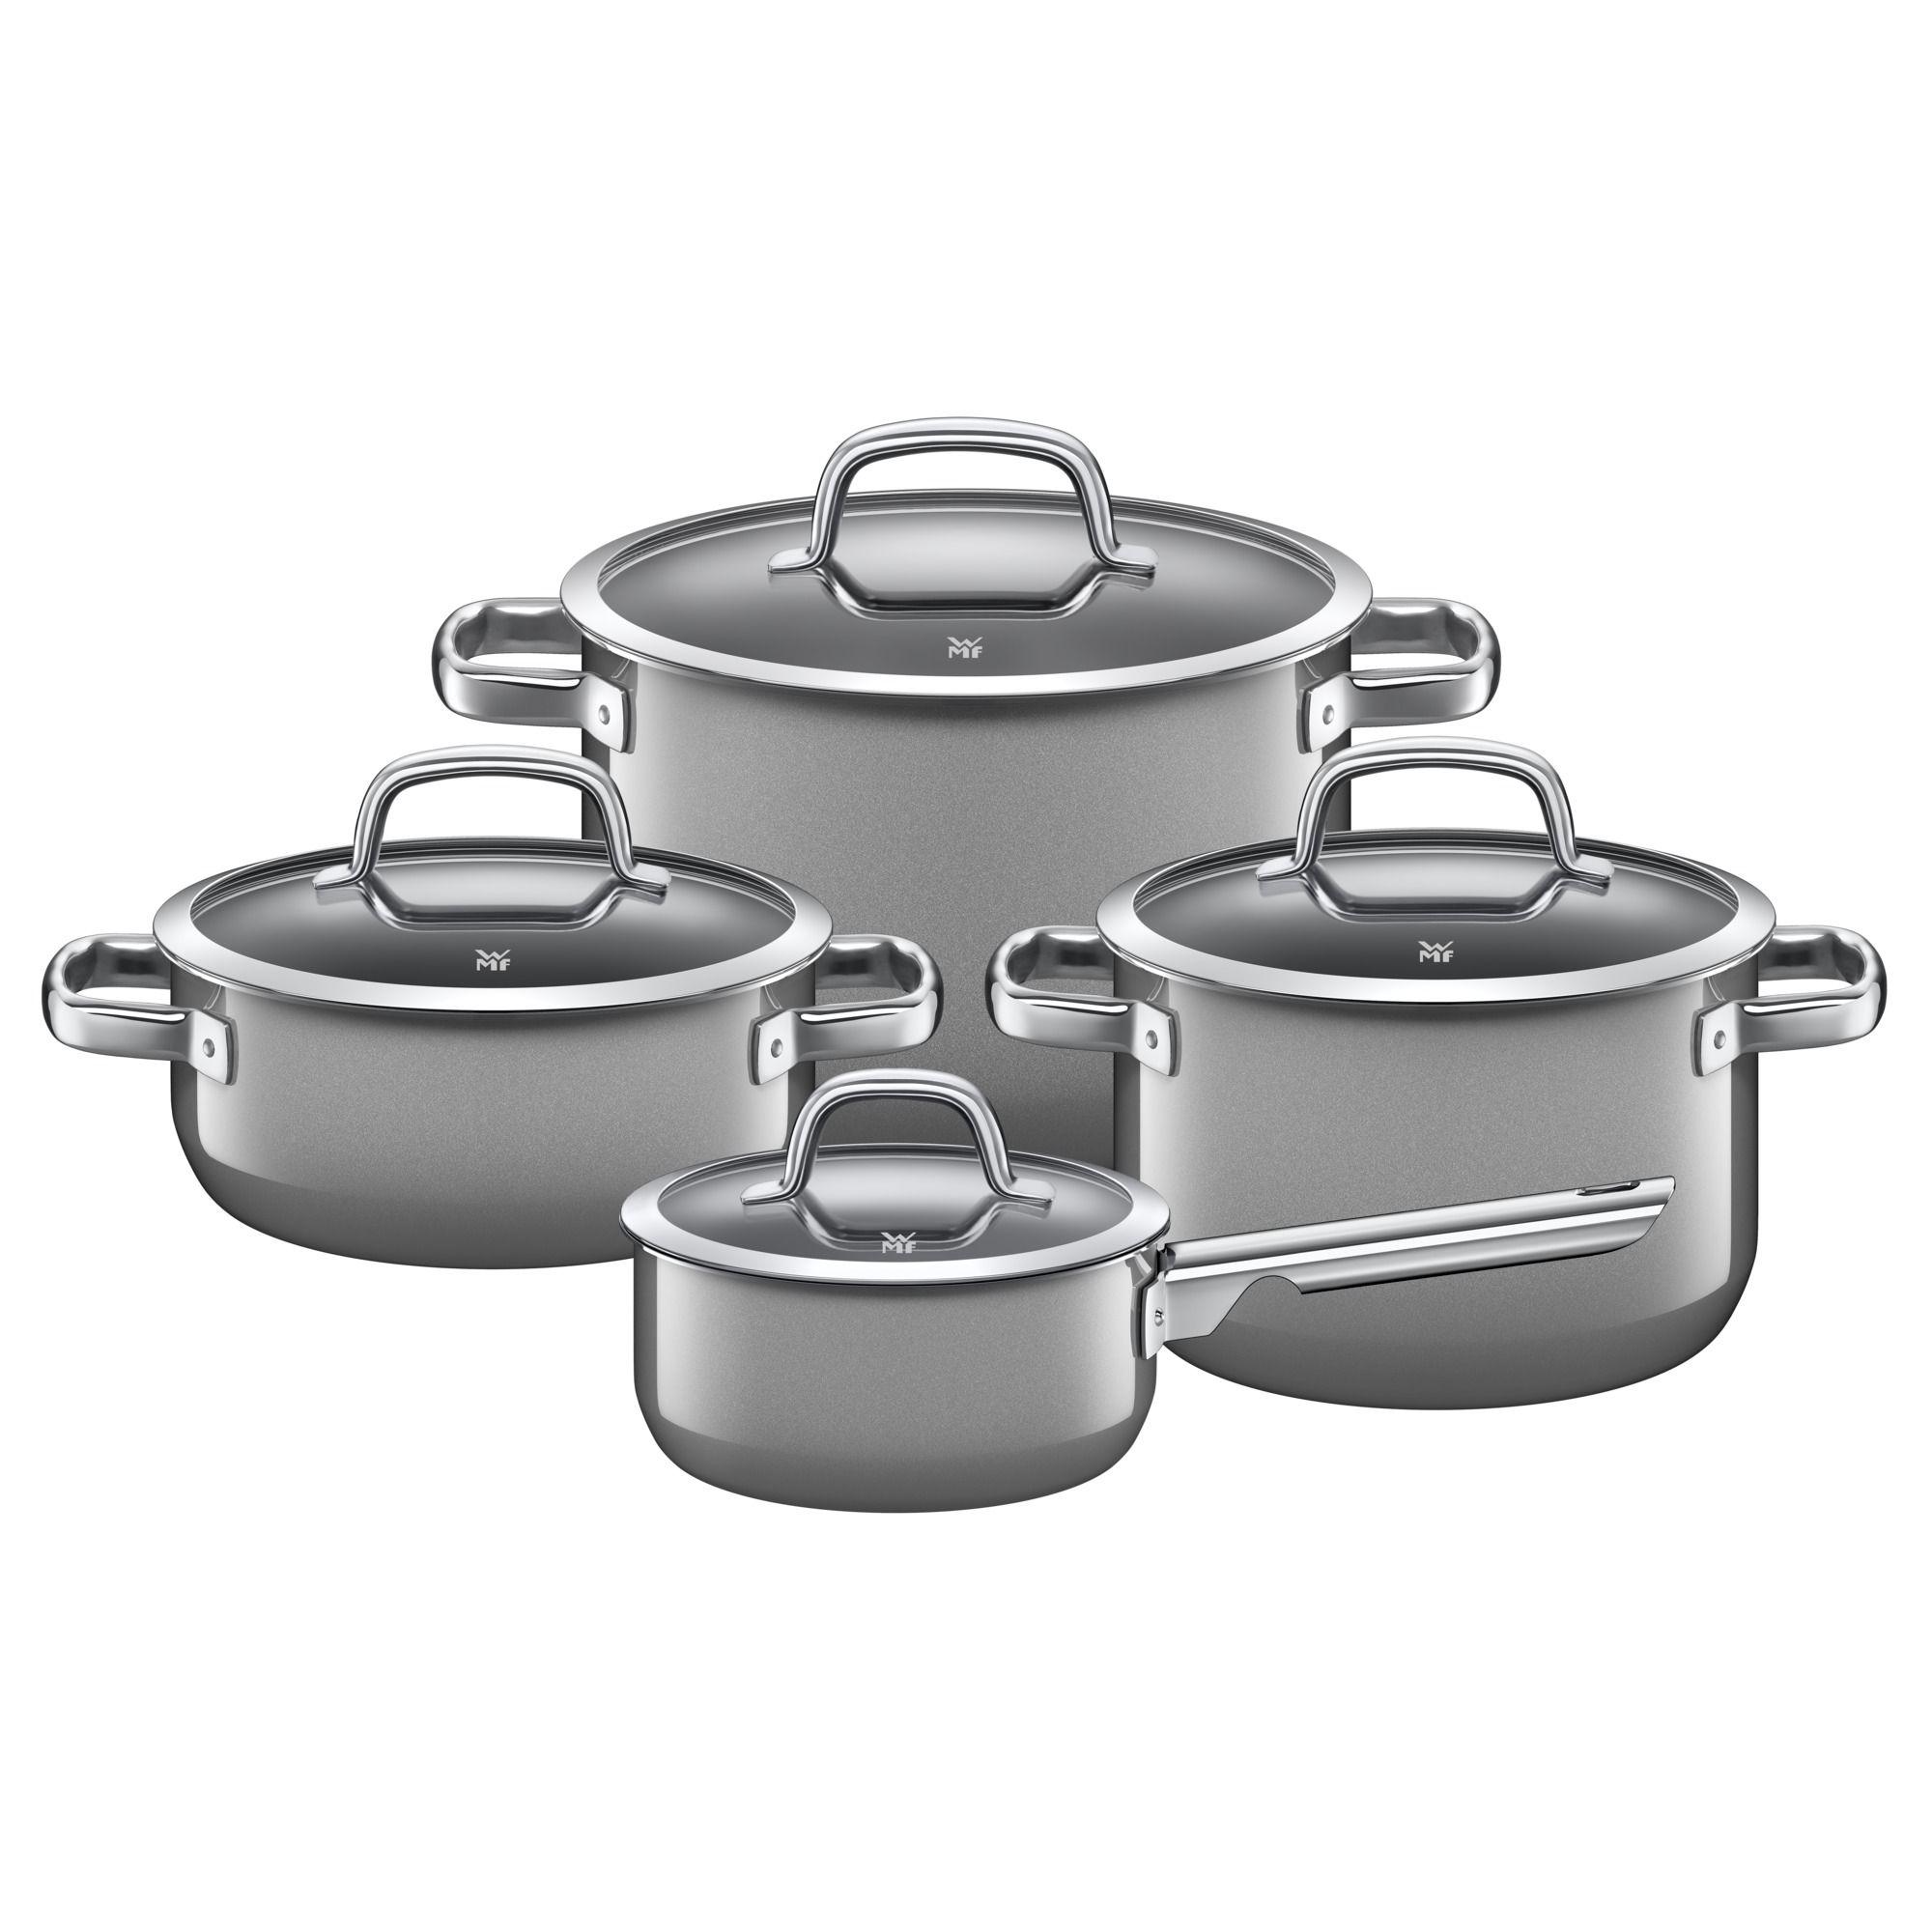 Wmf Fusiontec Platinum Eten En Drinken Koken Keukenapparatuur